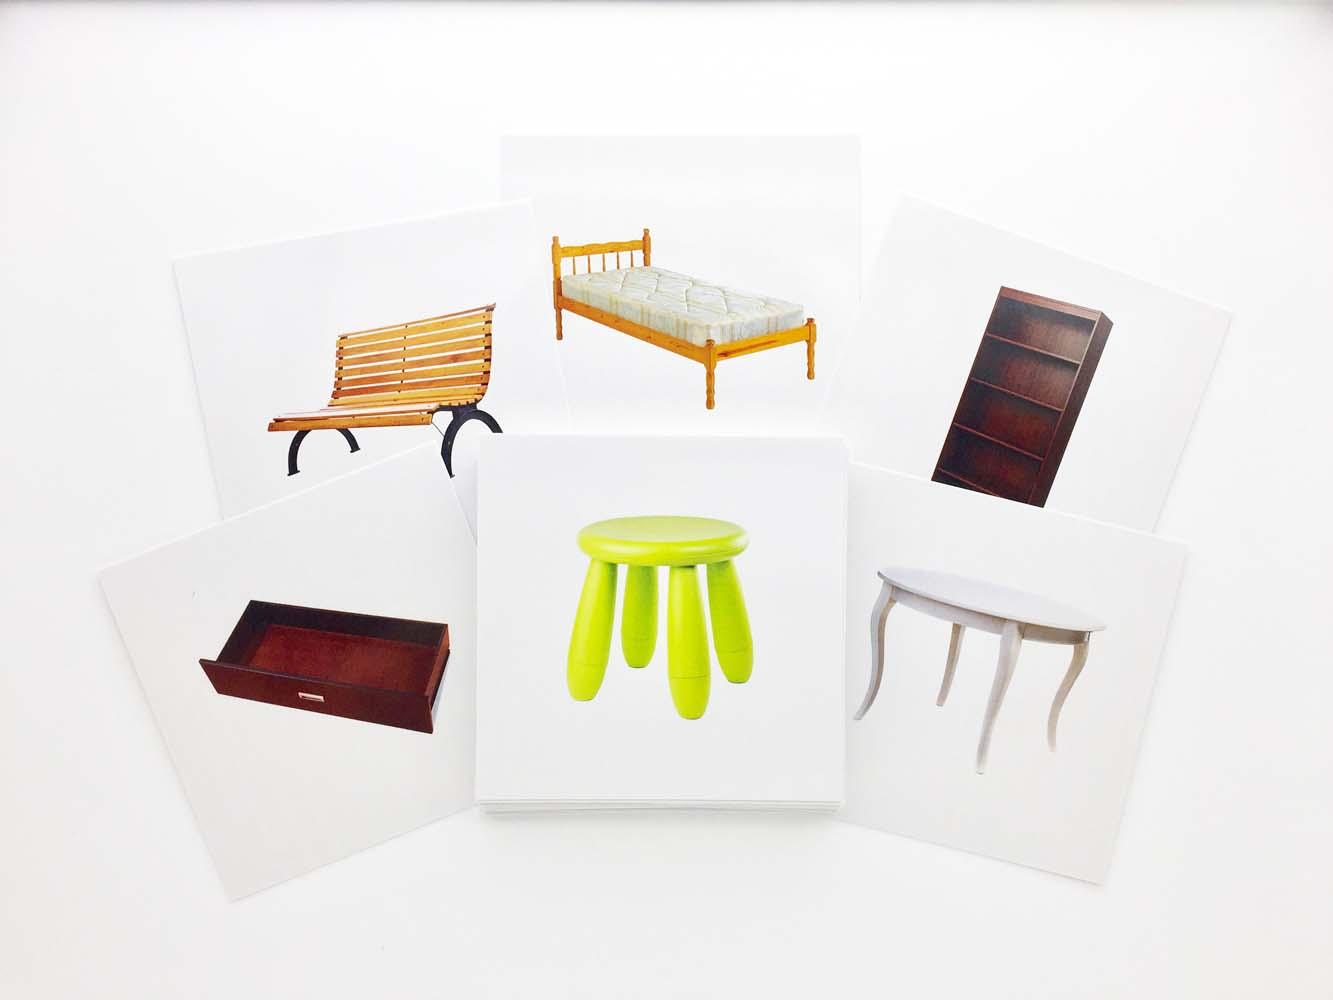 Buy Furnitures Flashcards - AutismSTEP